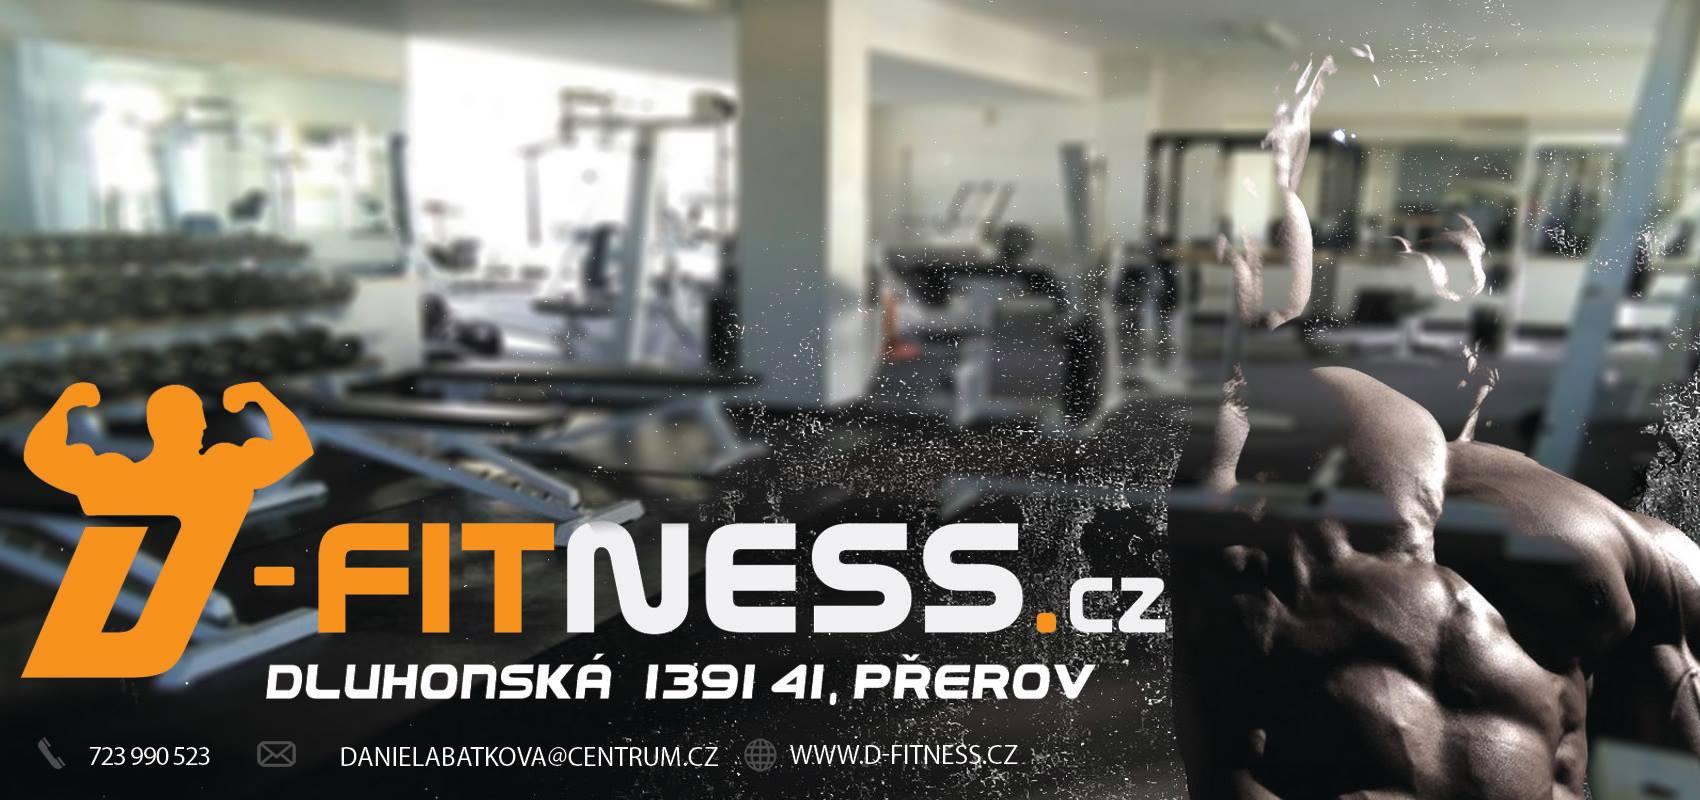 Fitness centrum D-fitness